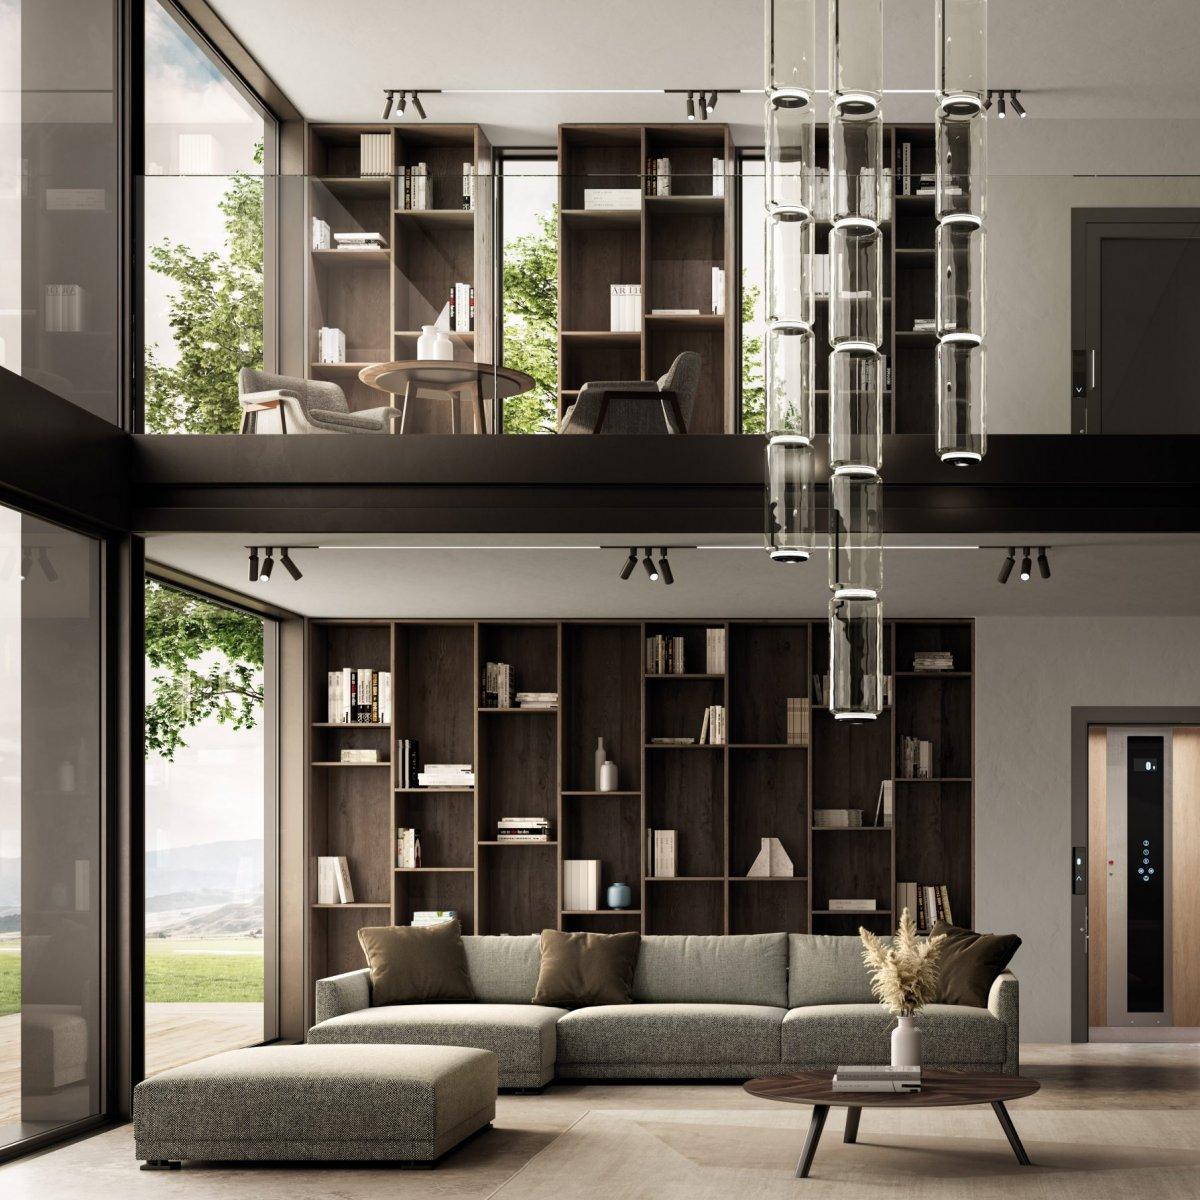 Home Lift   Simplex Elevators Gallery Image 4